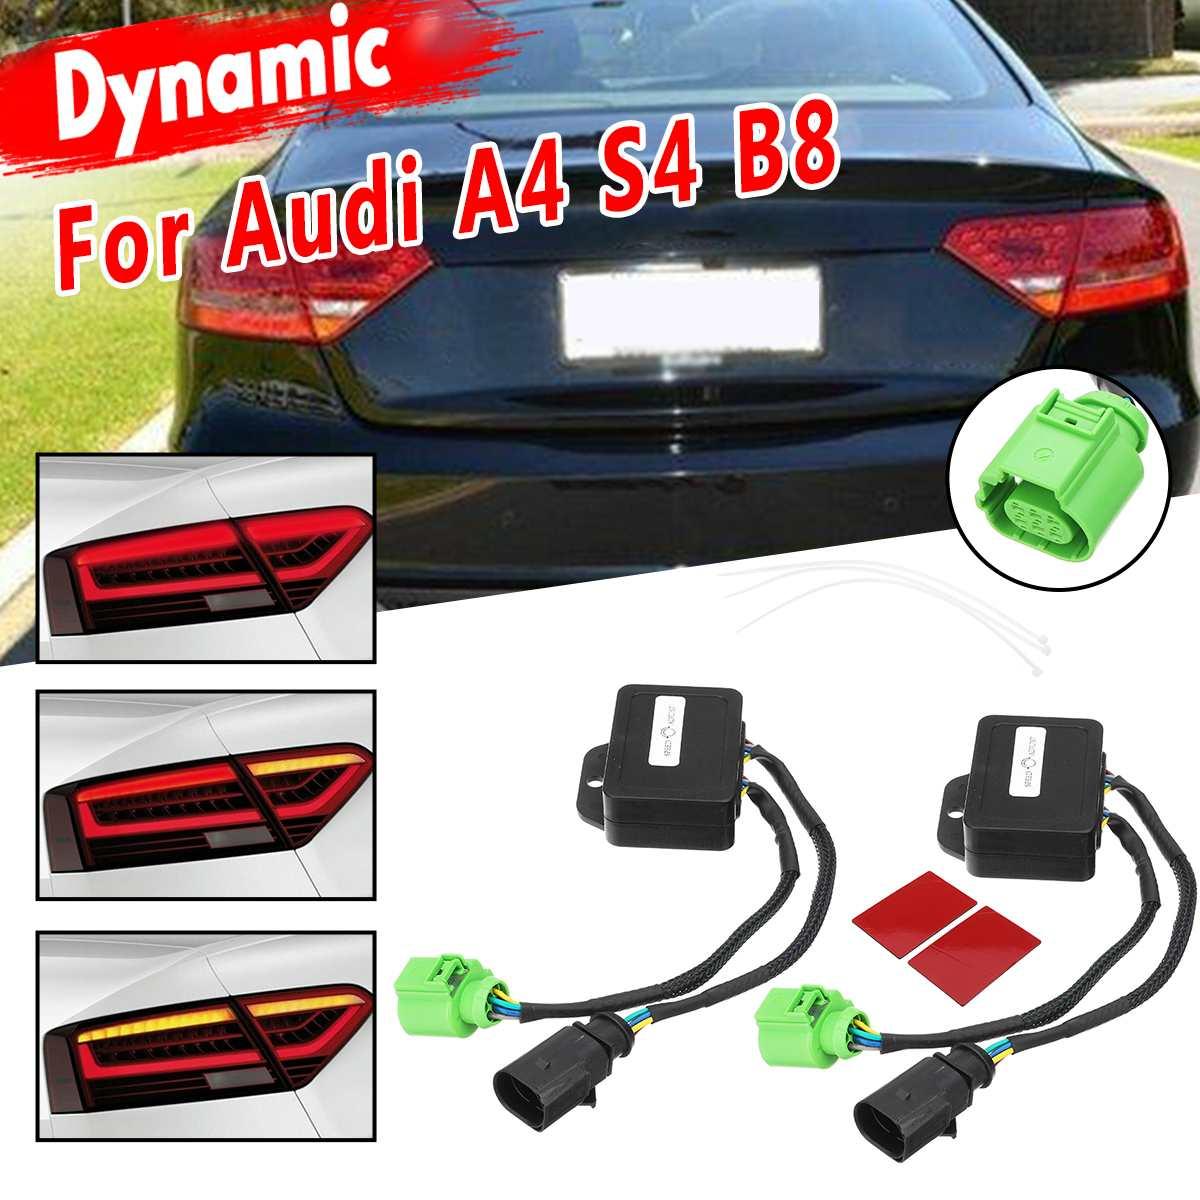 1 Pair Limo Semi Dynamic Taillights Turn Signal Indicator LED Taillights Module For Audi A4 S4 B8 2012-2018 Sedan